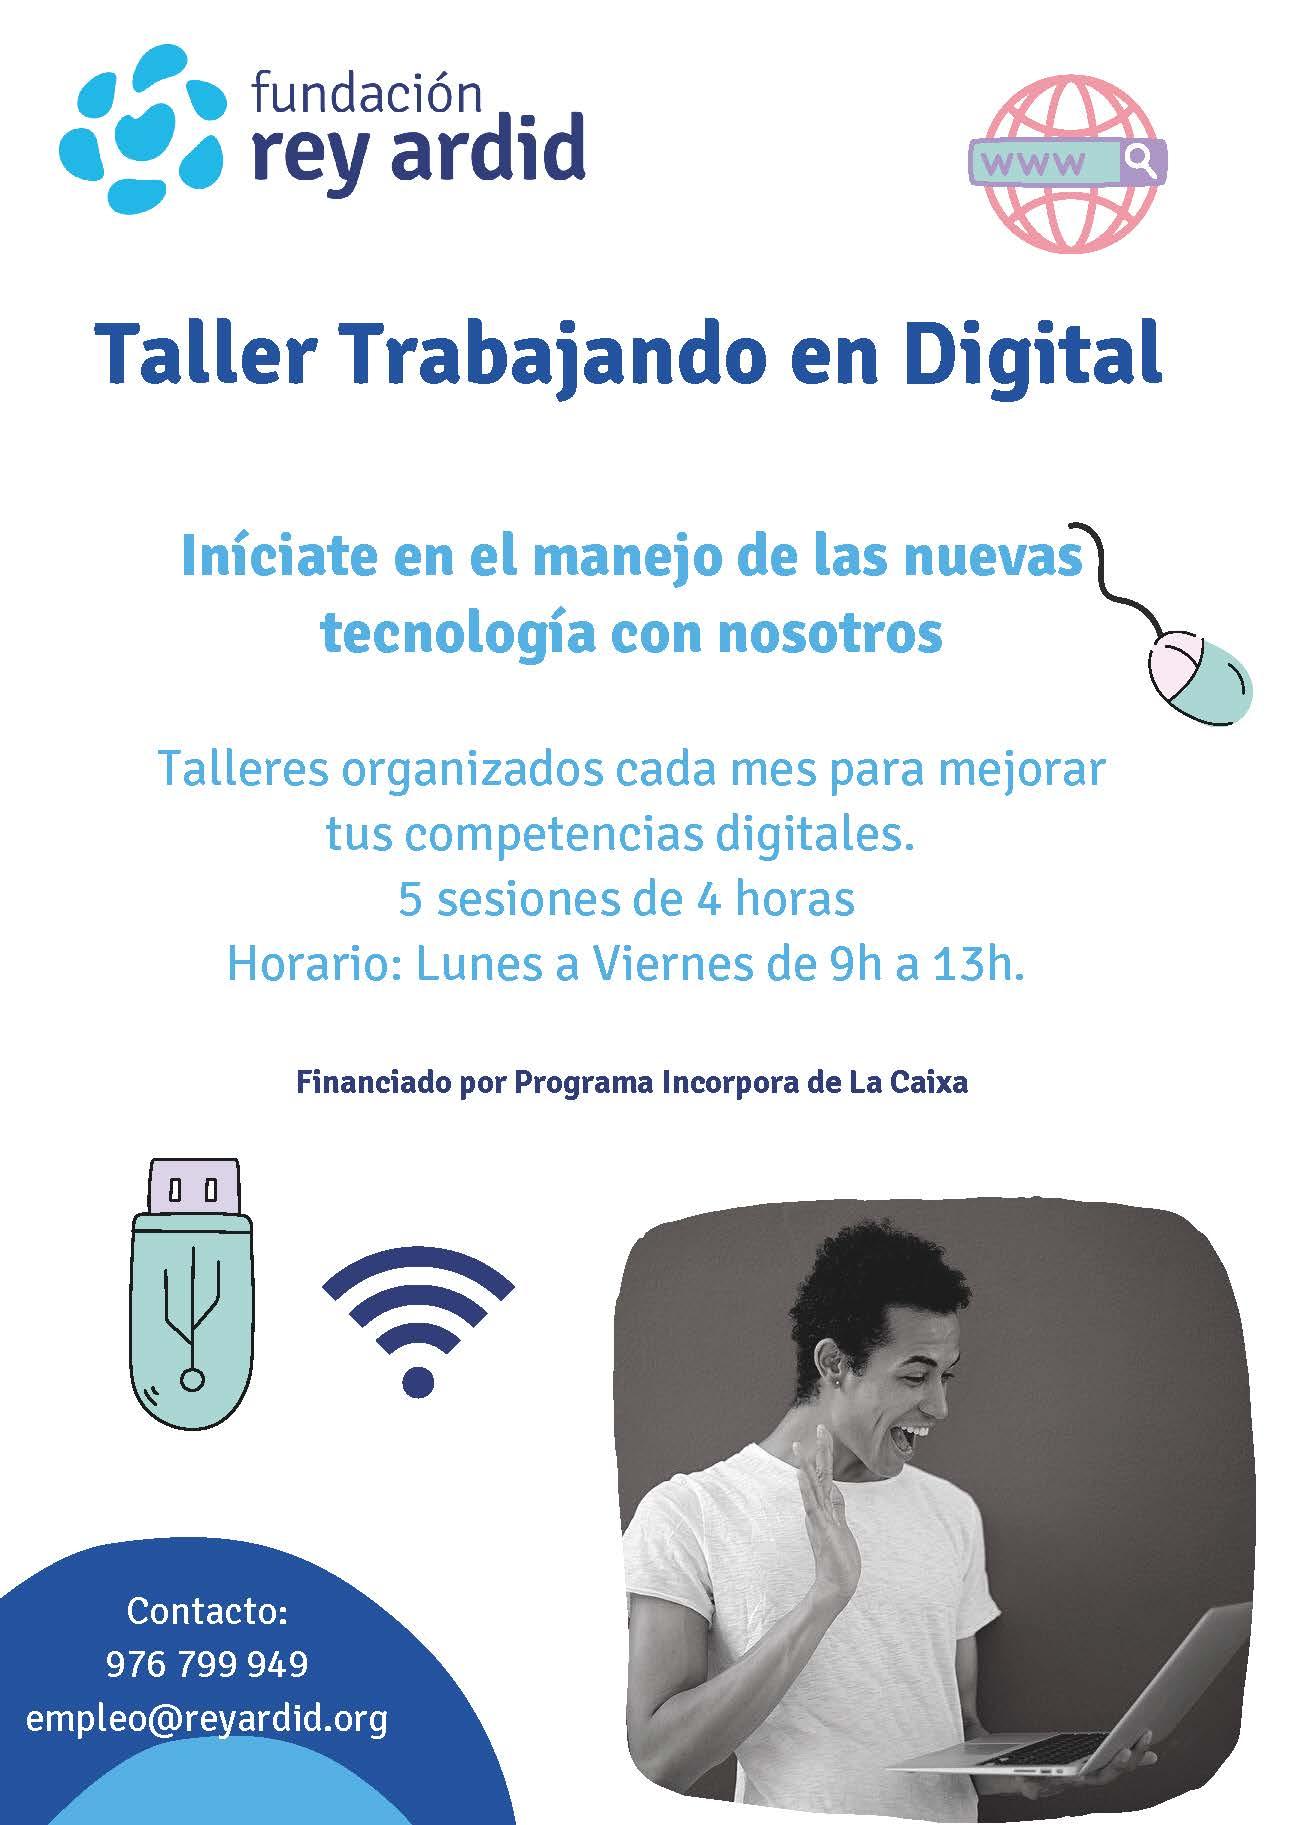 Talleres Trabajando en Digital